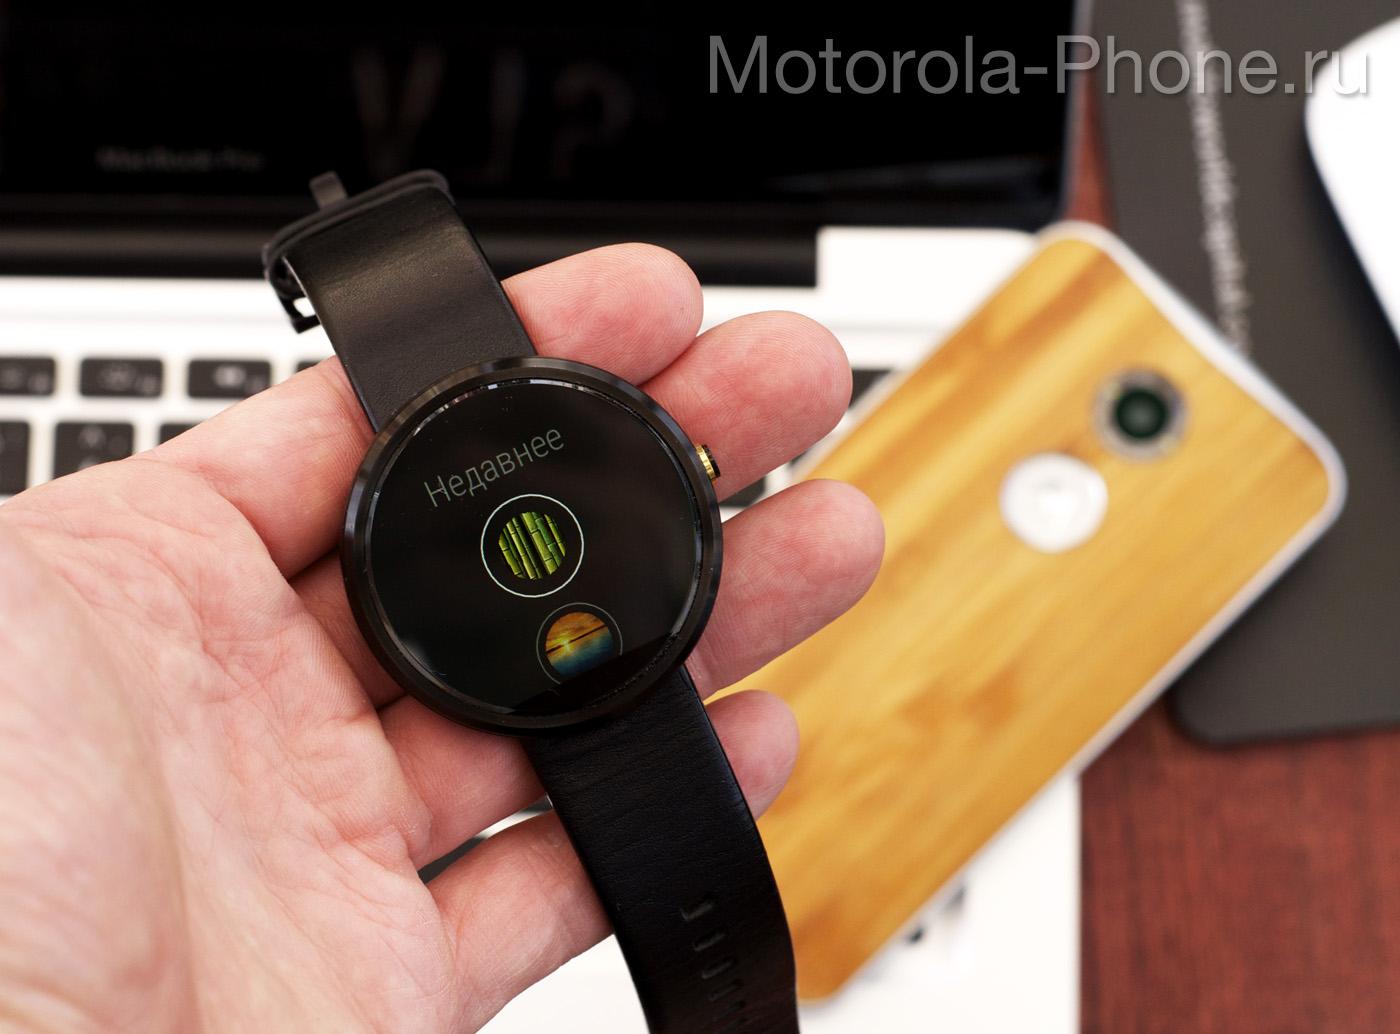 Motorola-Moto-Connect-5